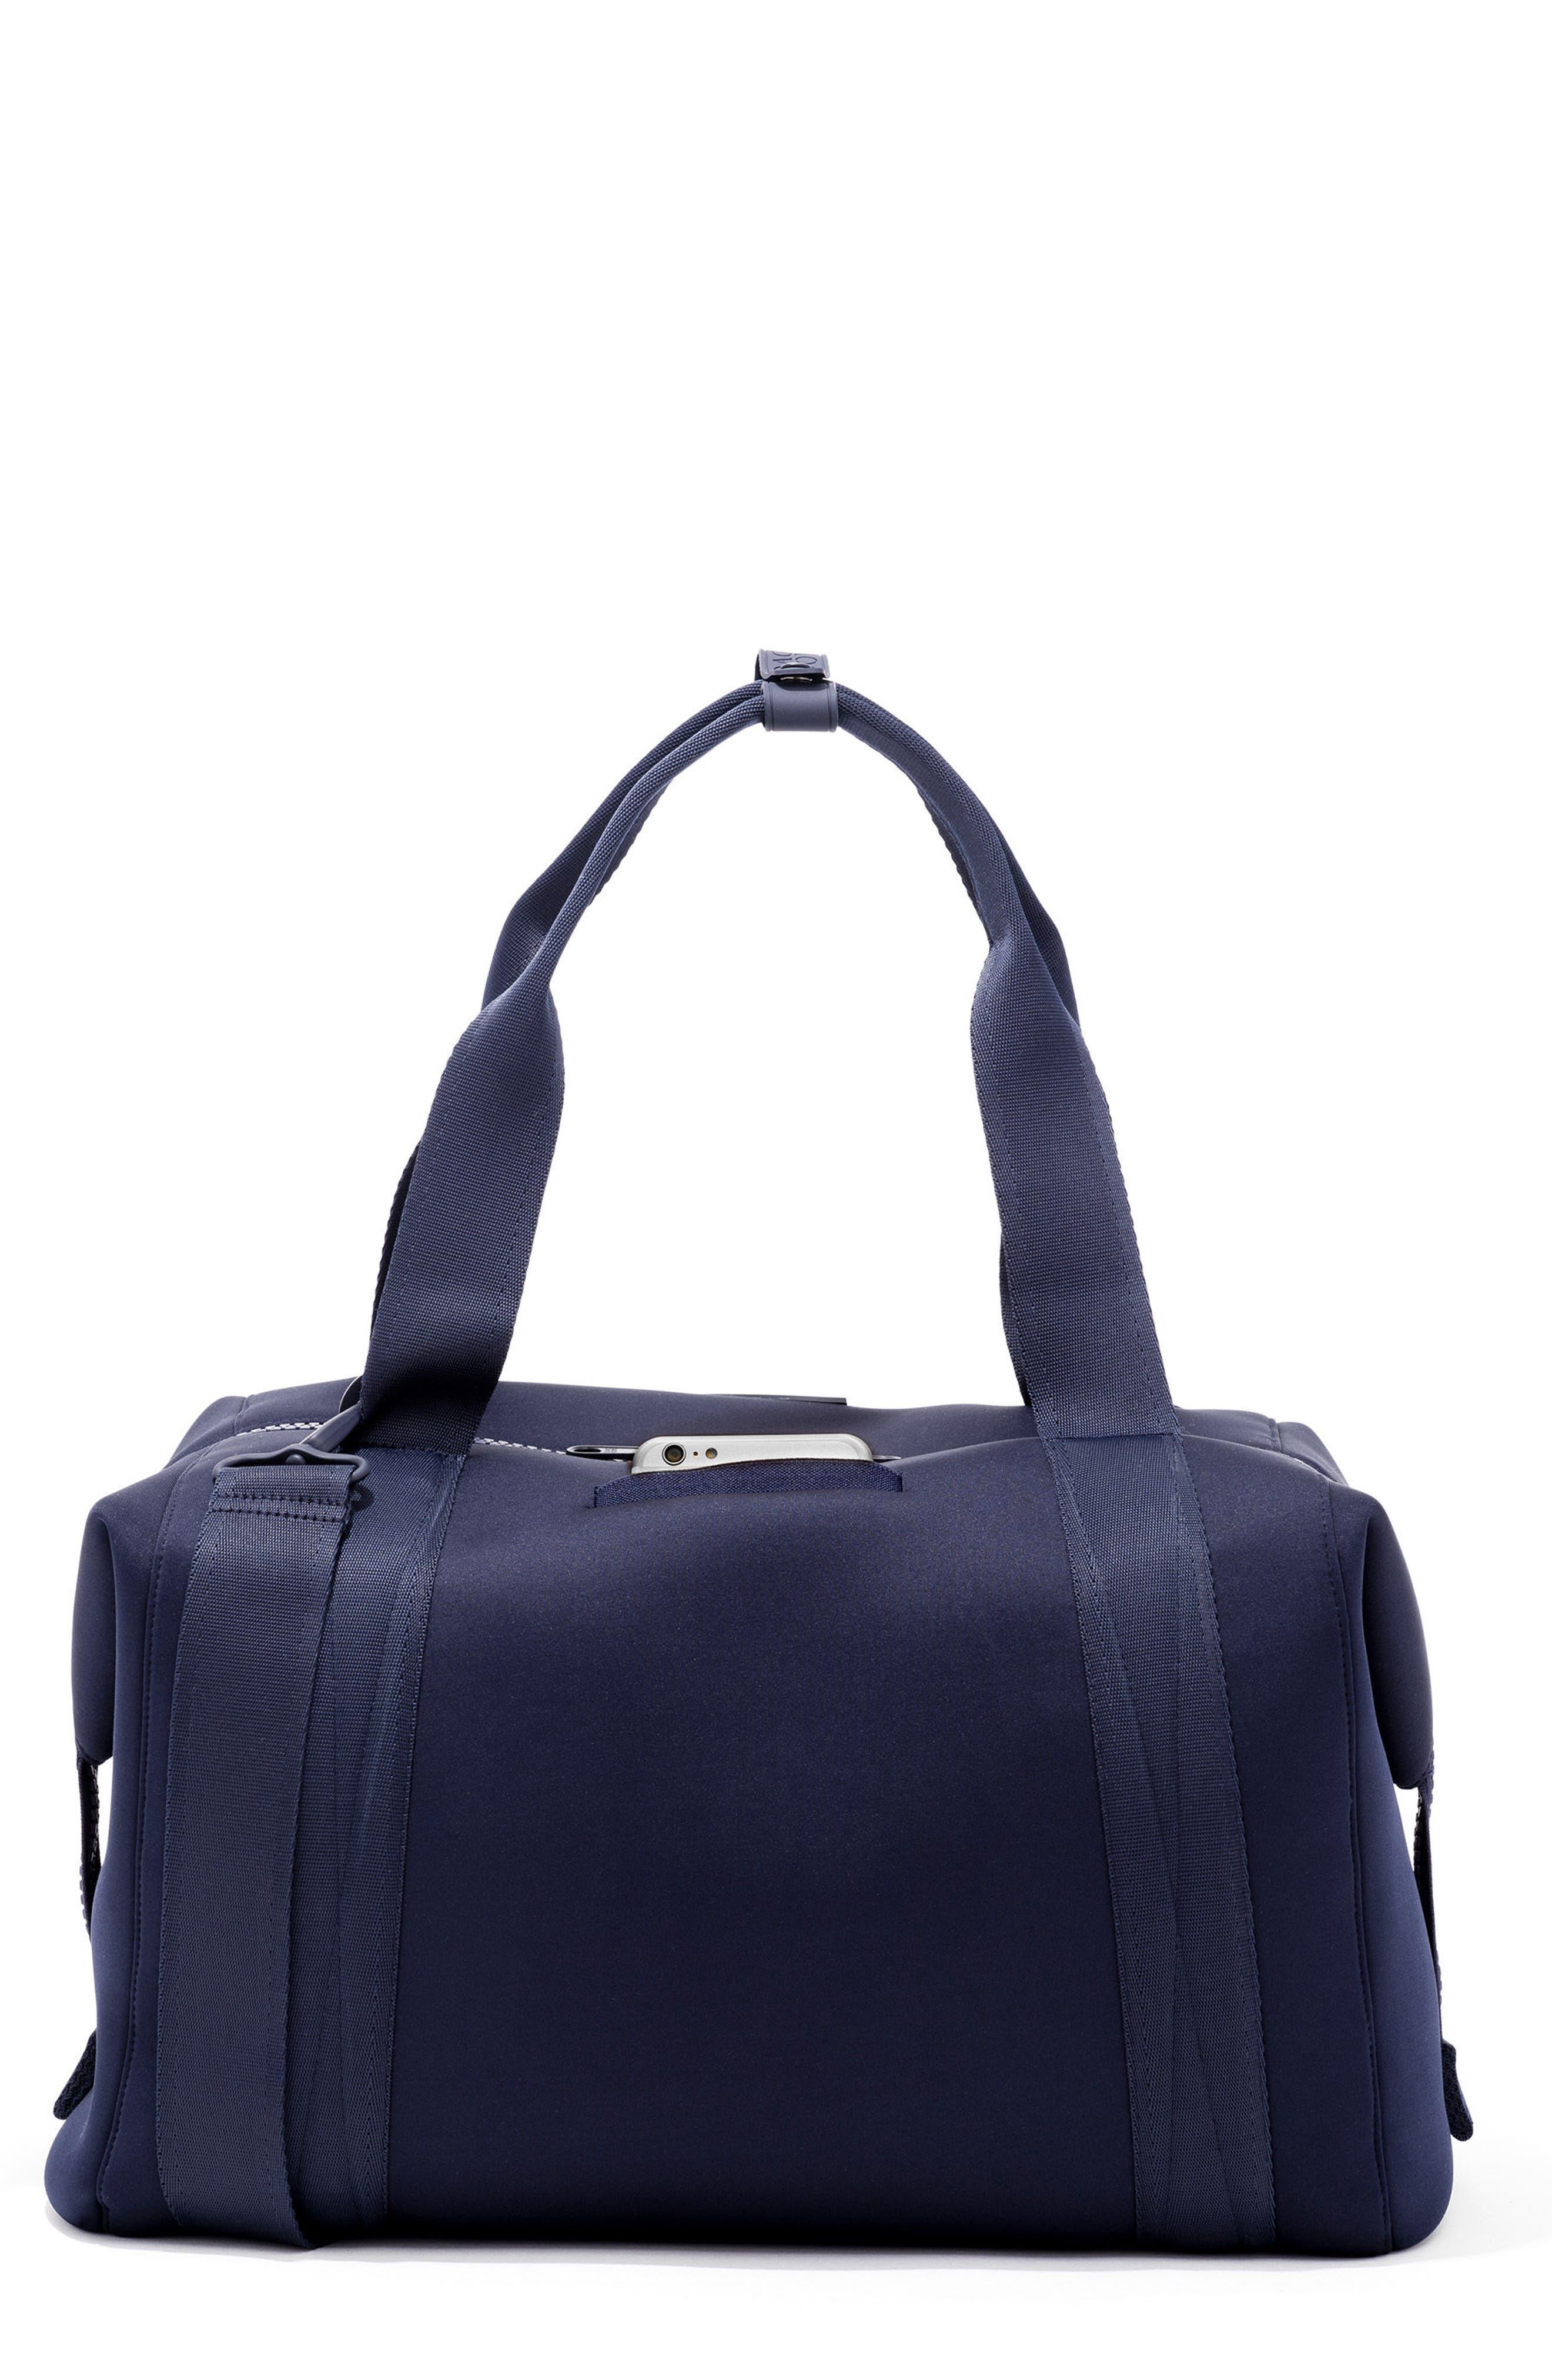 365 Large Landon Neoprene Carryall Duffel Bag,                             Main thumbnail 5, color,